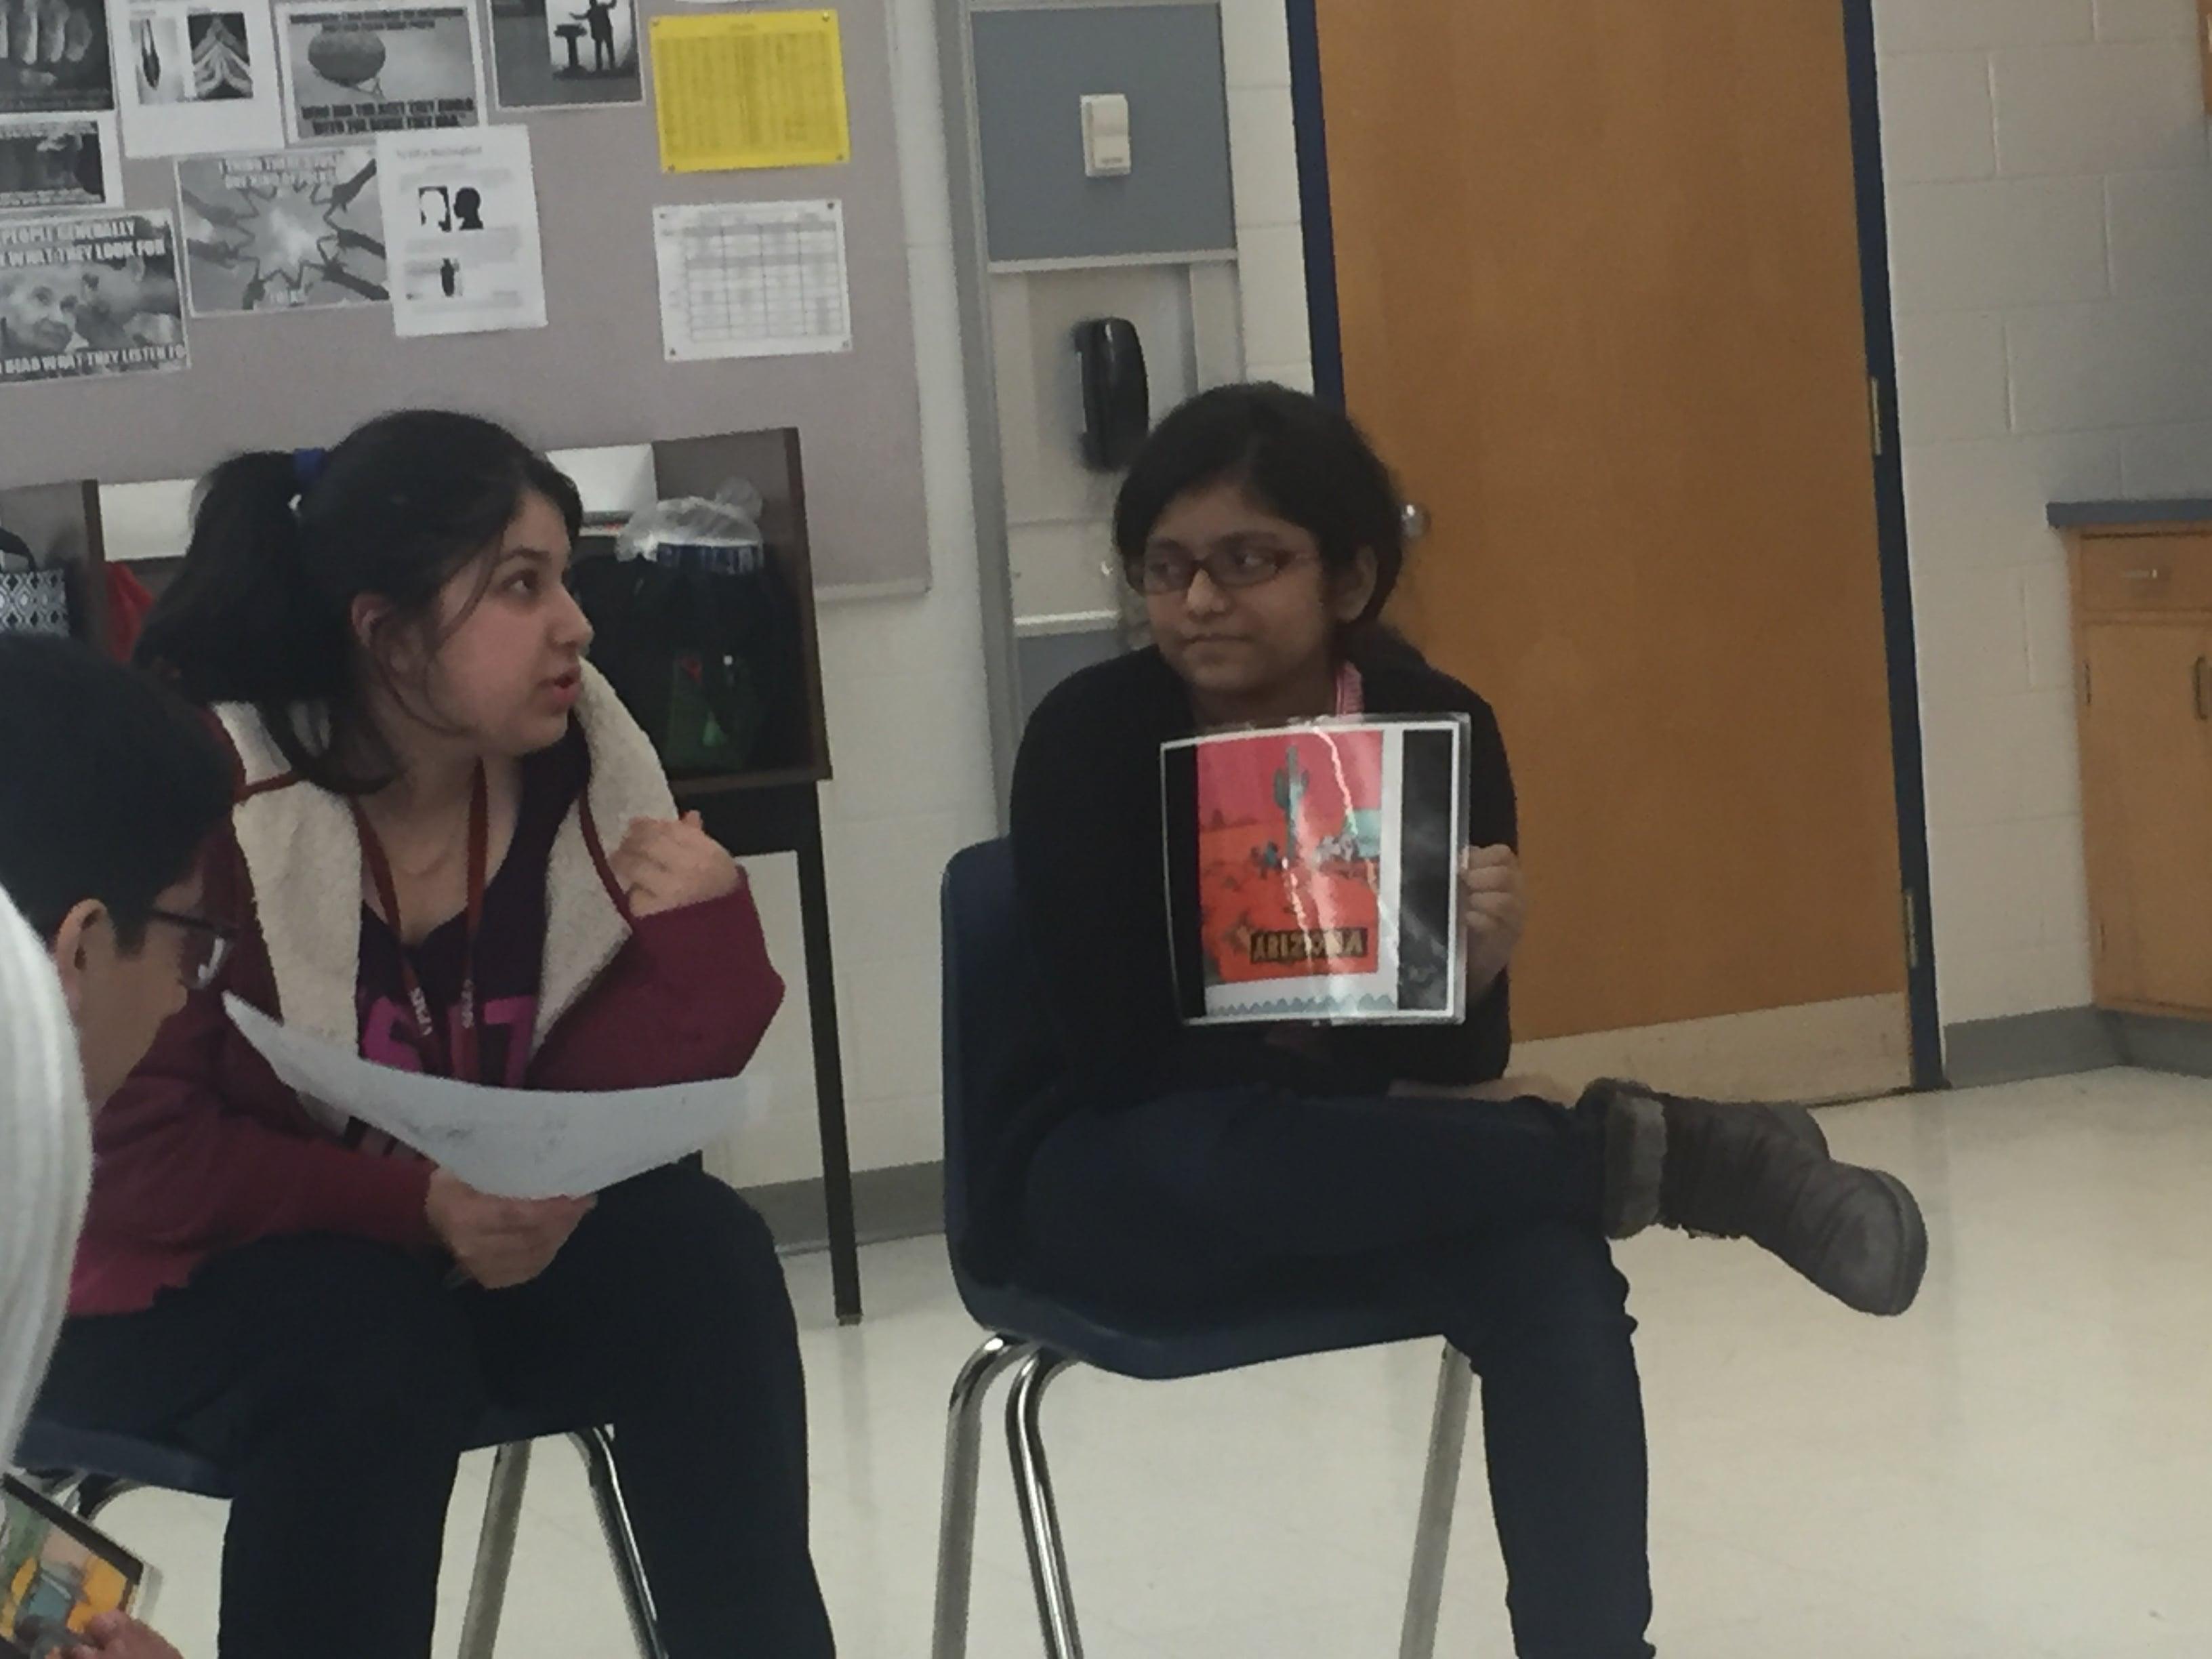 Youth LED community develops communication skills